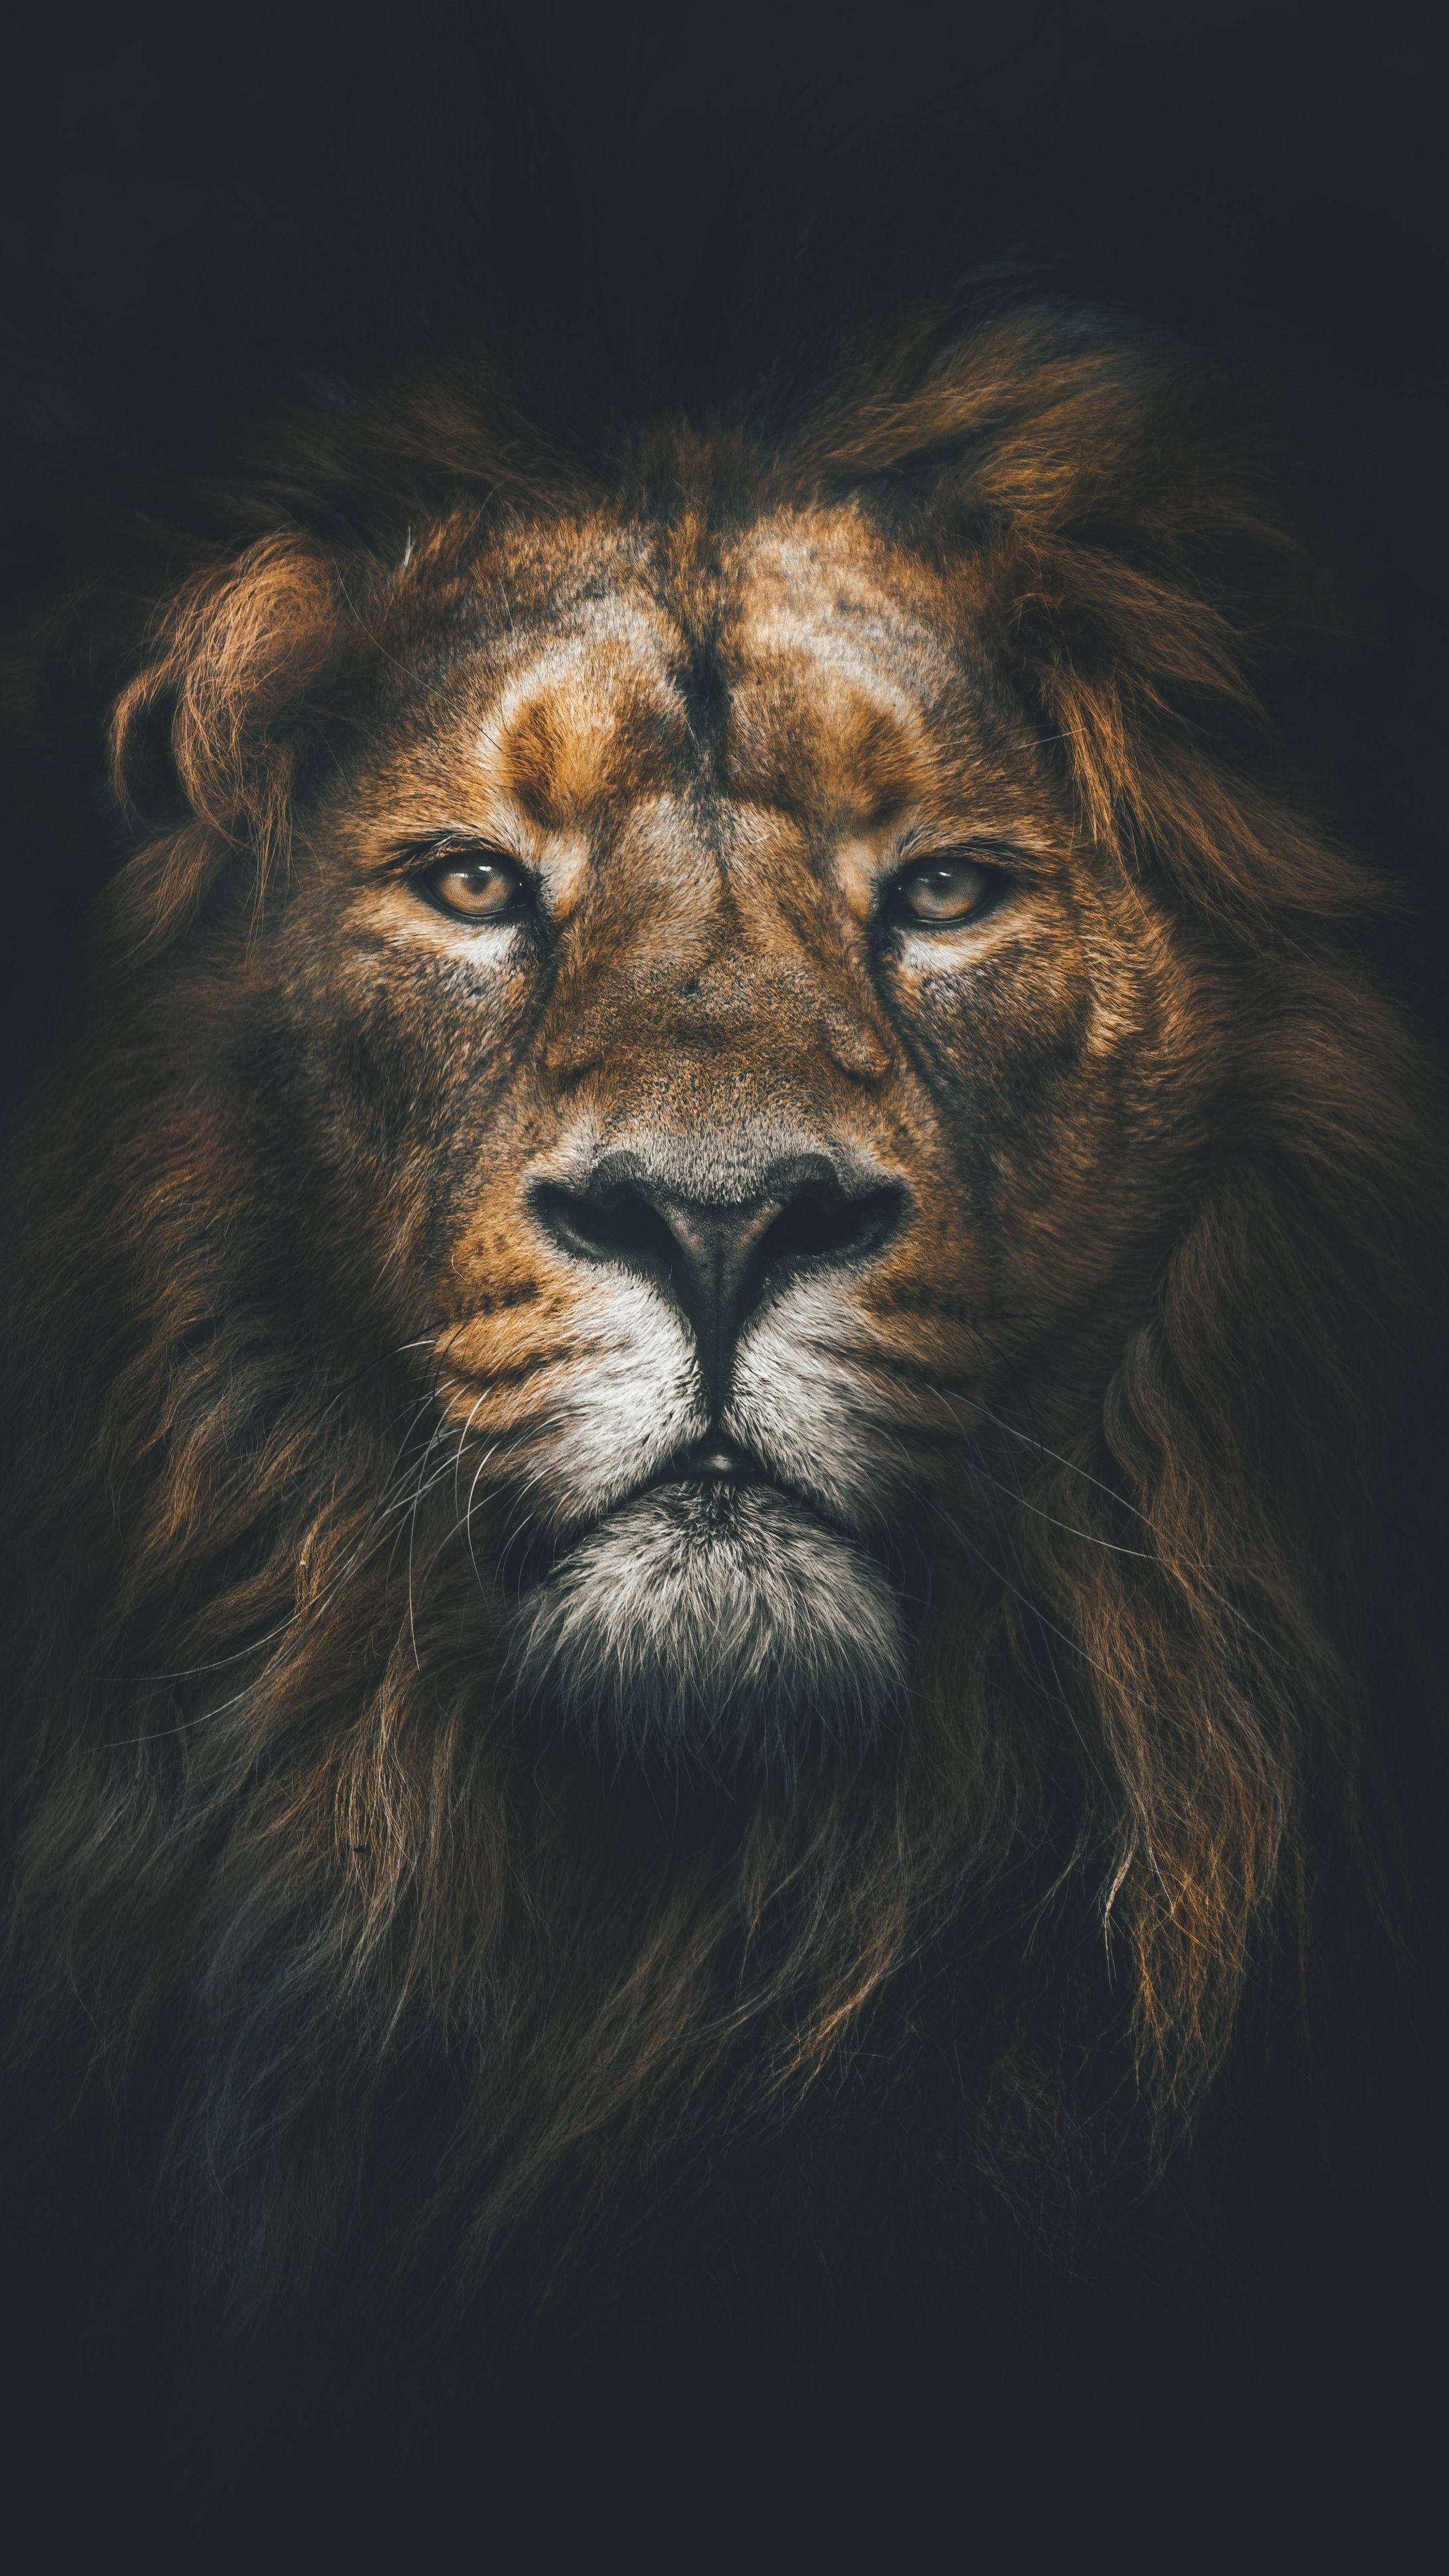 Download 2160x3840 Lion Face Mane Look Predatory Lvy 4kwallpaper 4kwallpaperphone 4kchristmaswall Animal Wallpaper Lion Wallpaper Lion Pictures